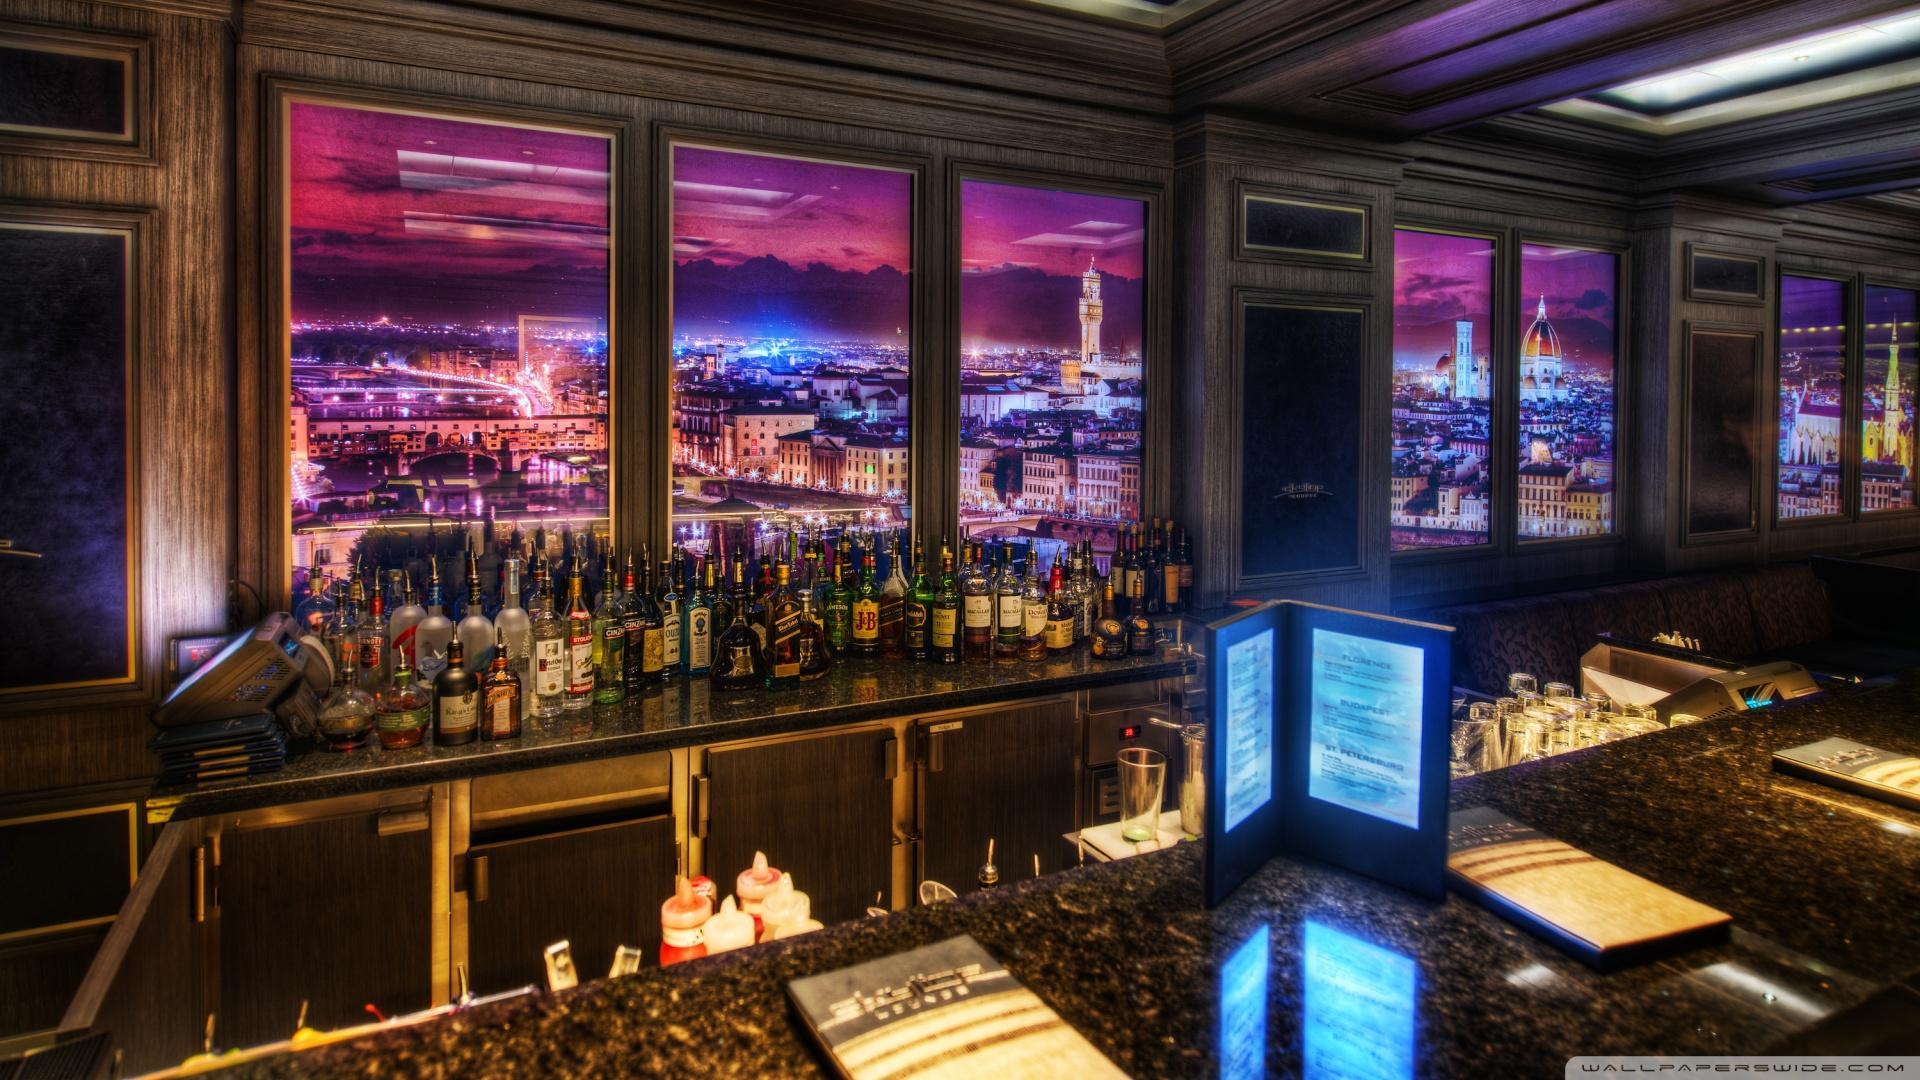 Skyline Bar Wallpaper 1920x1080 Skyline Bar 1920x1080